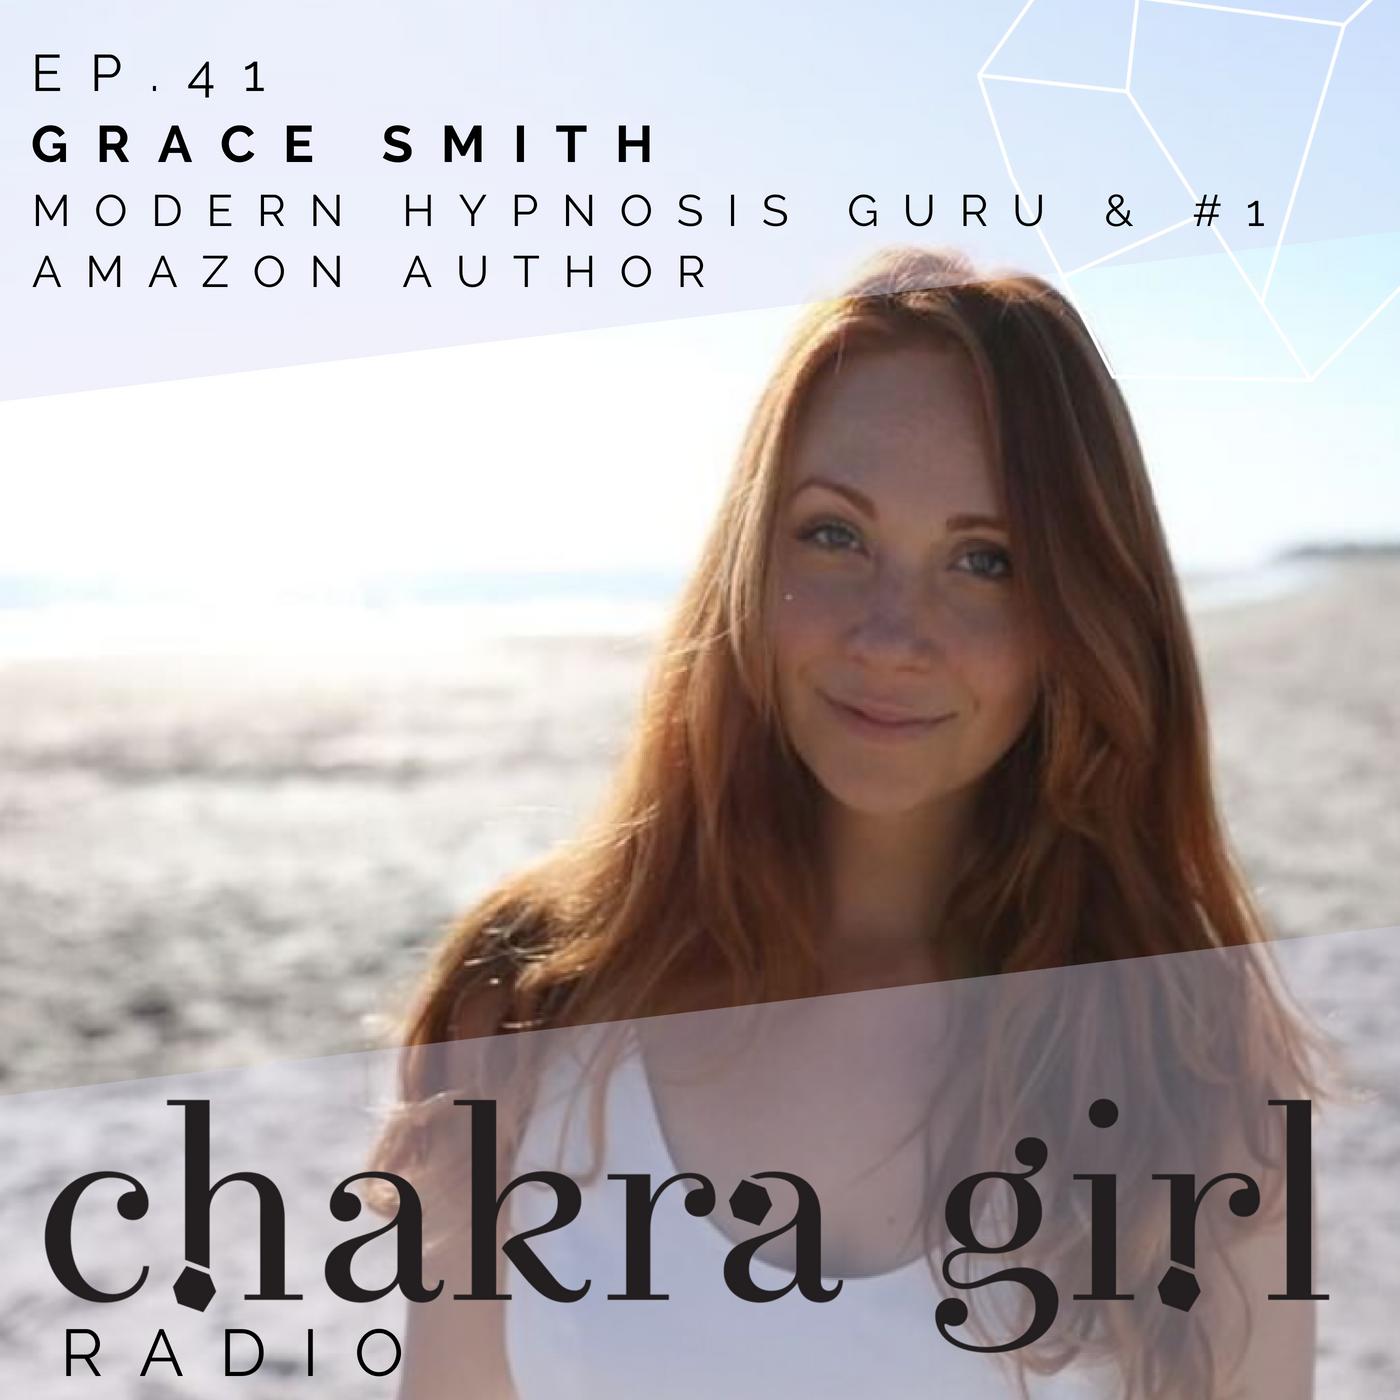 CHAKRA+GIRL+RADIO+GRACE+SMITH.png